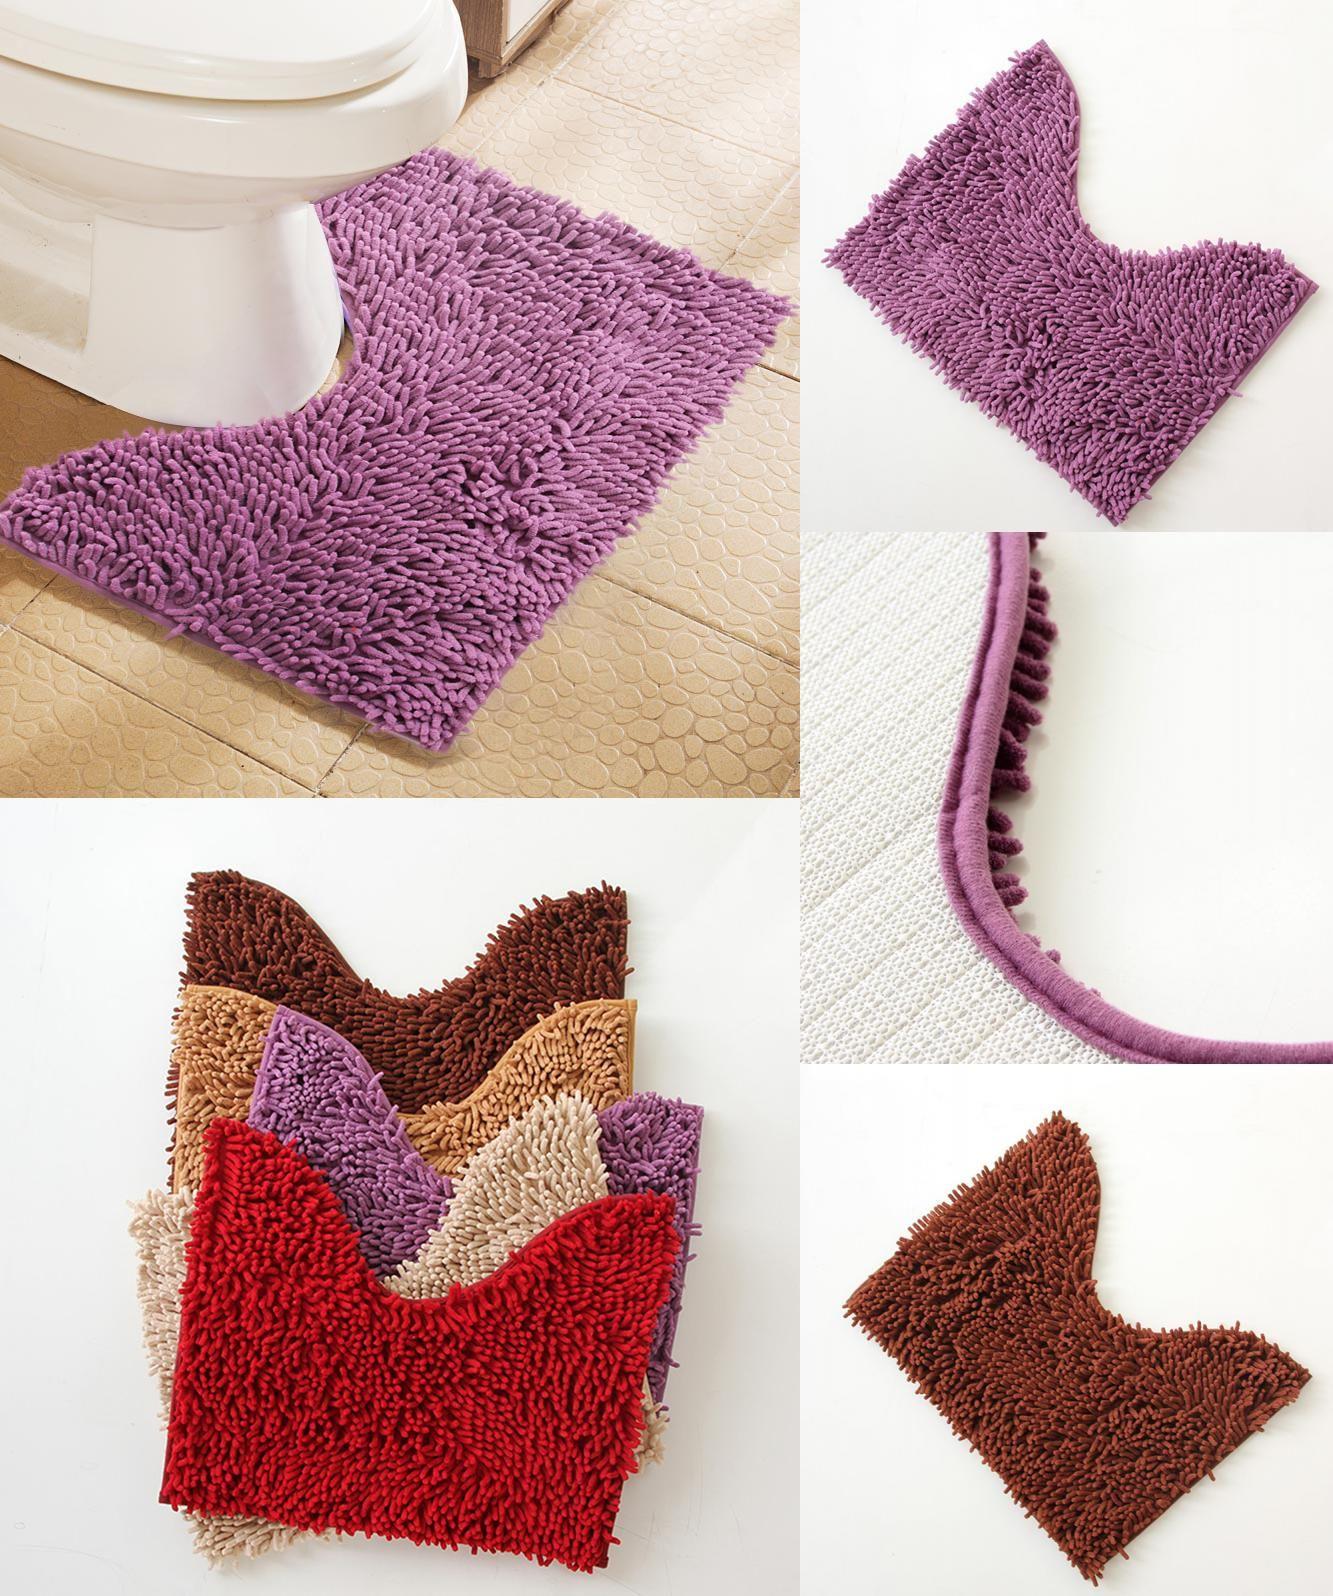 visit to buy] cheap 40*50cm u shape bathroom mats set toilet